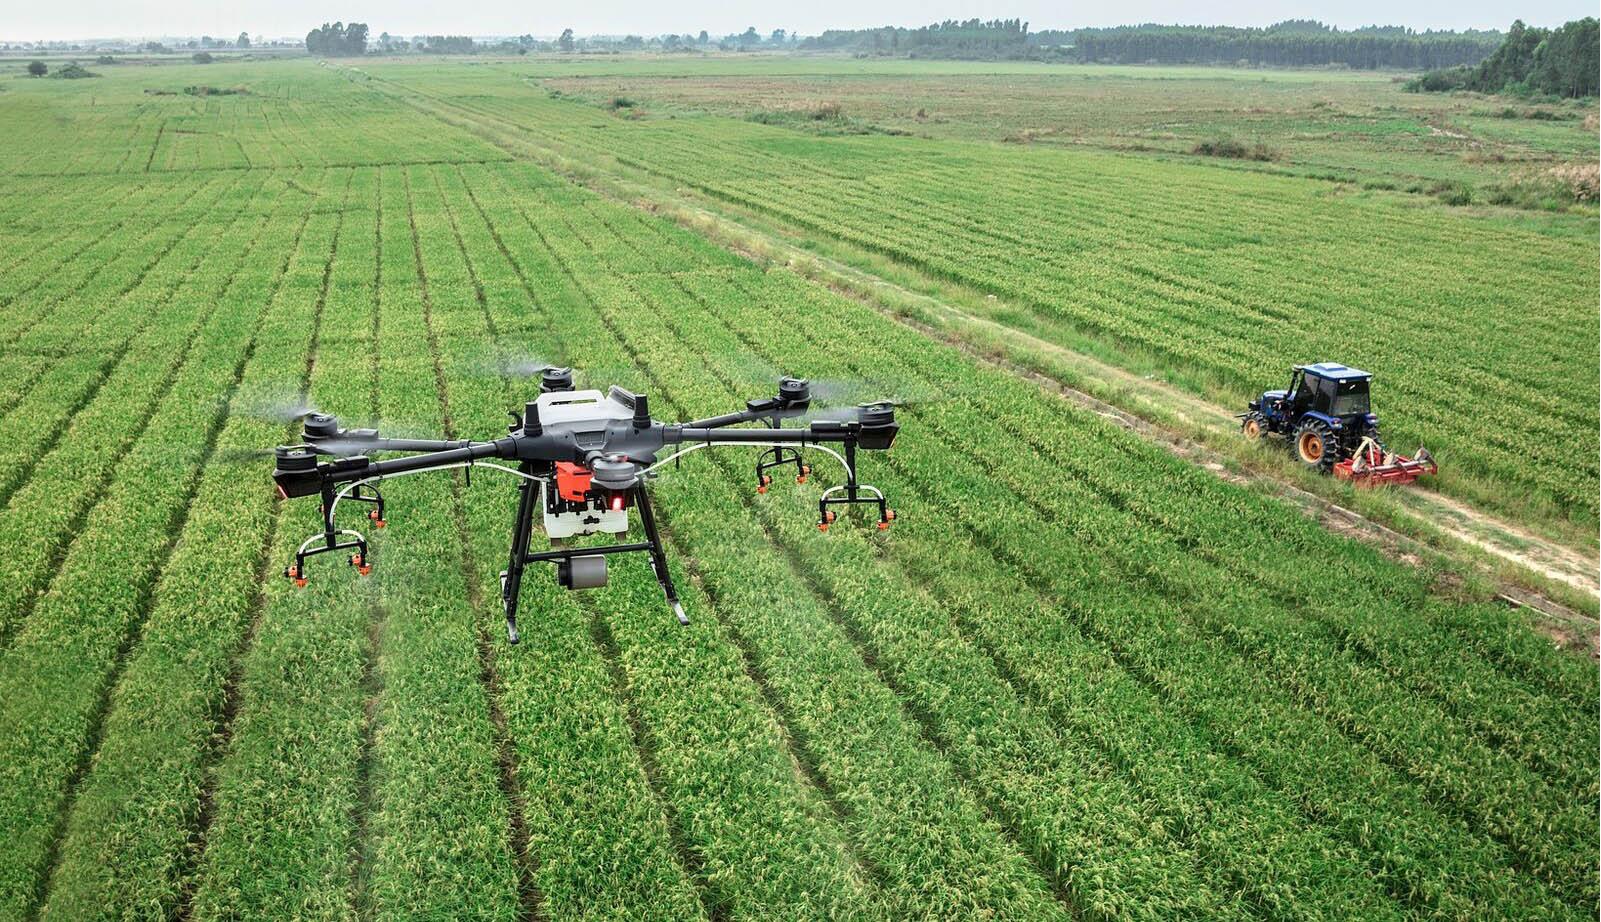 Segíthetnek a drónok